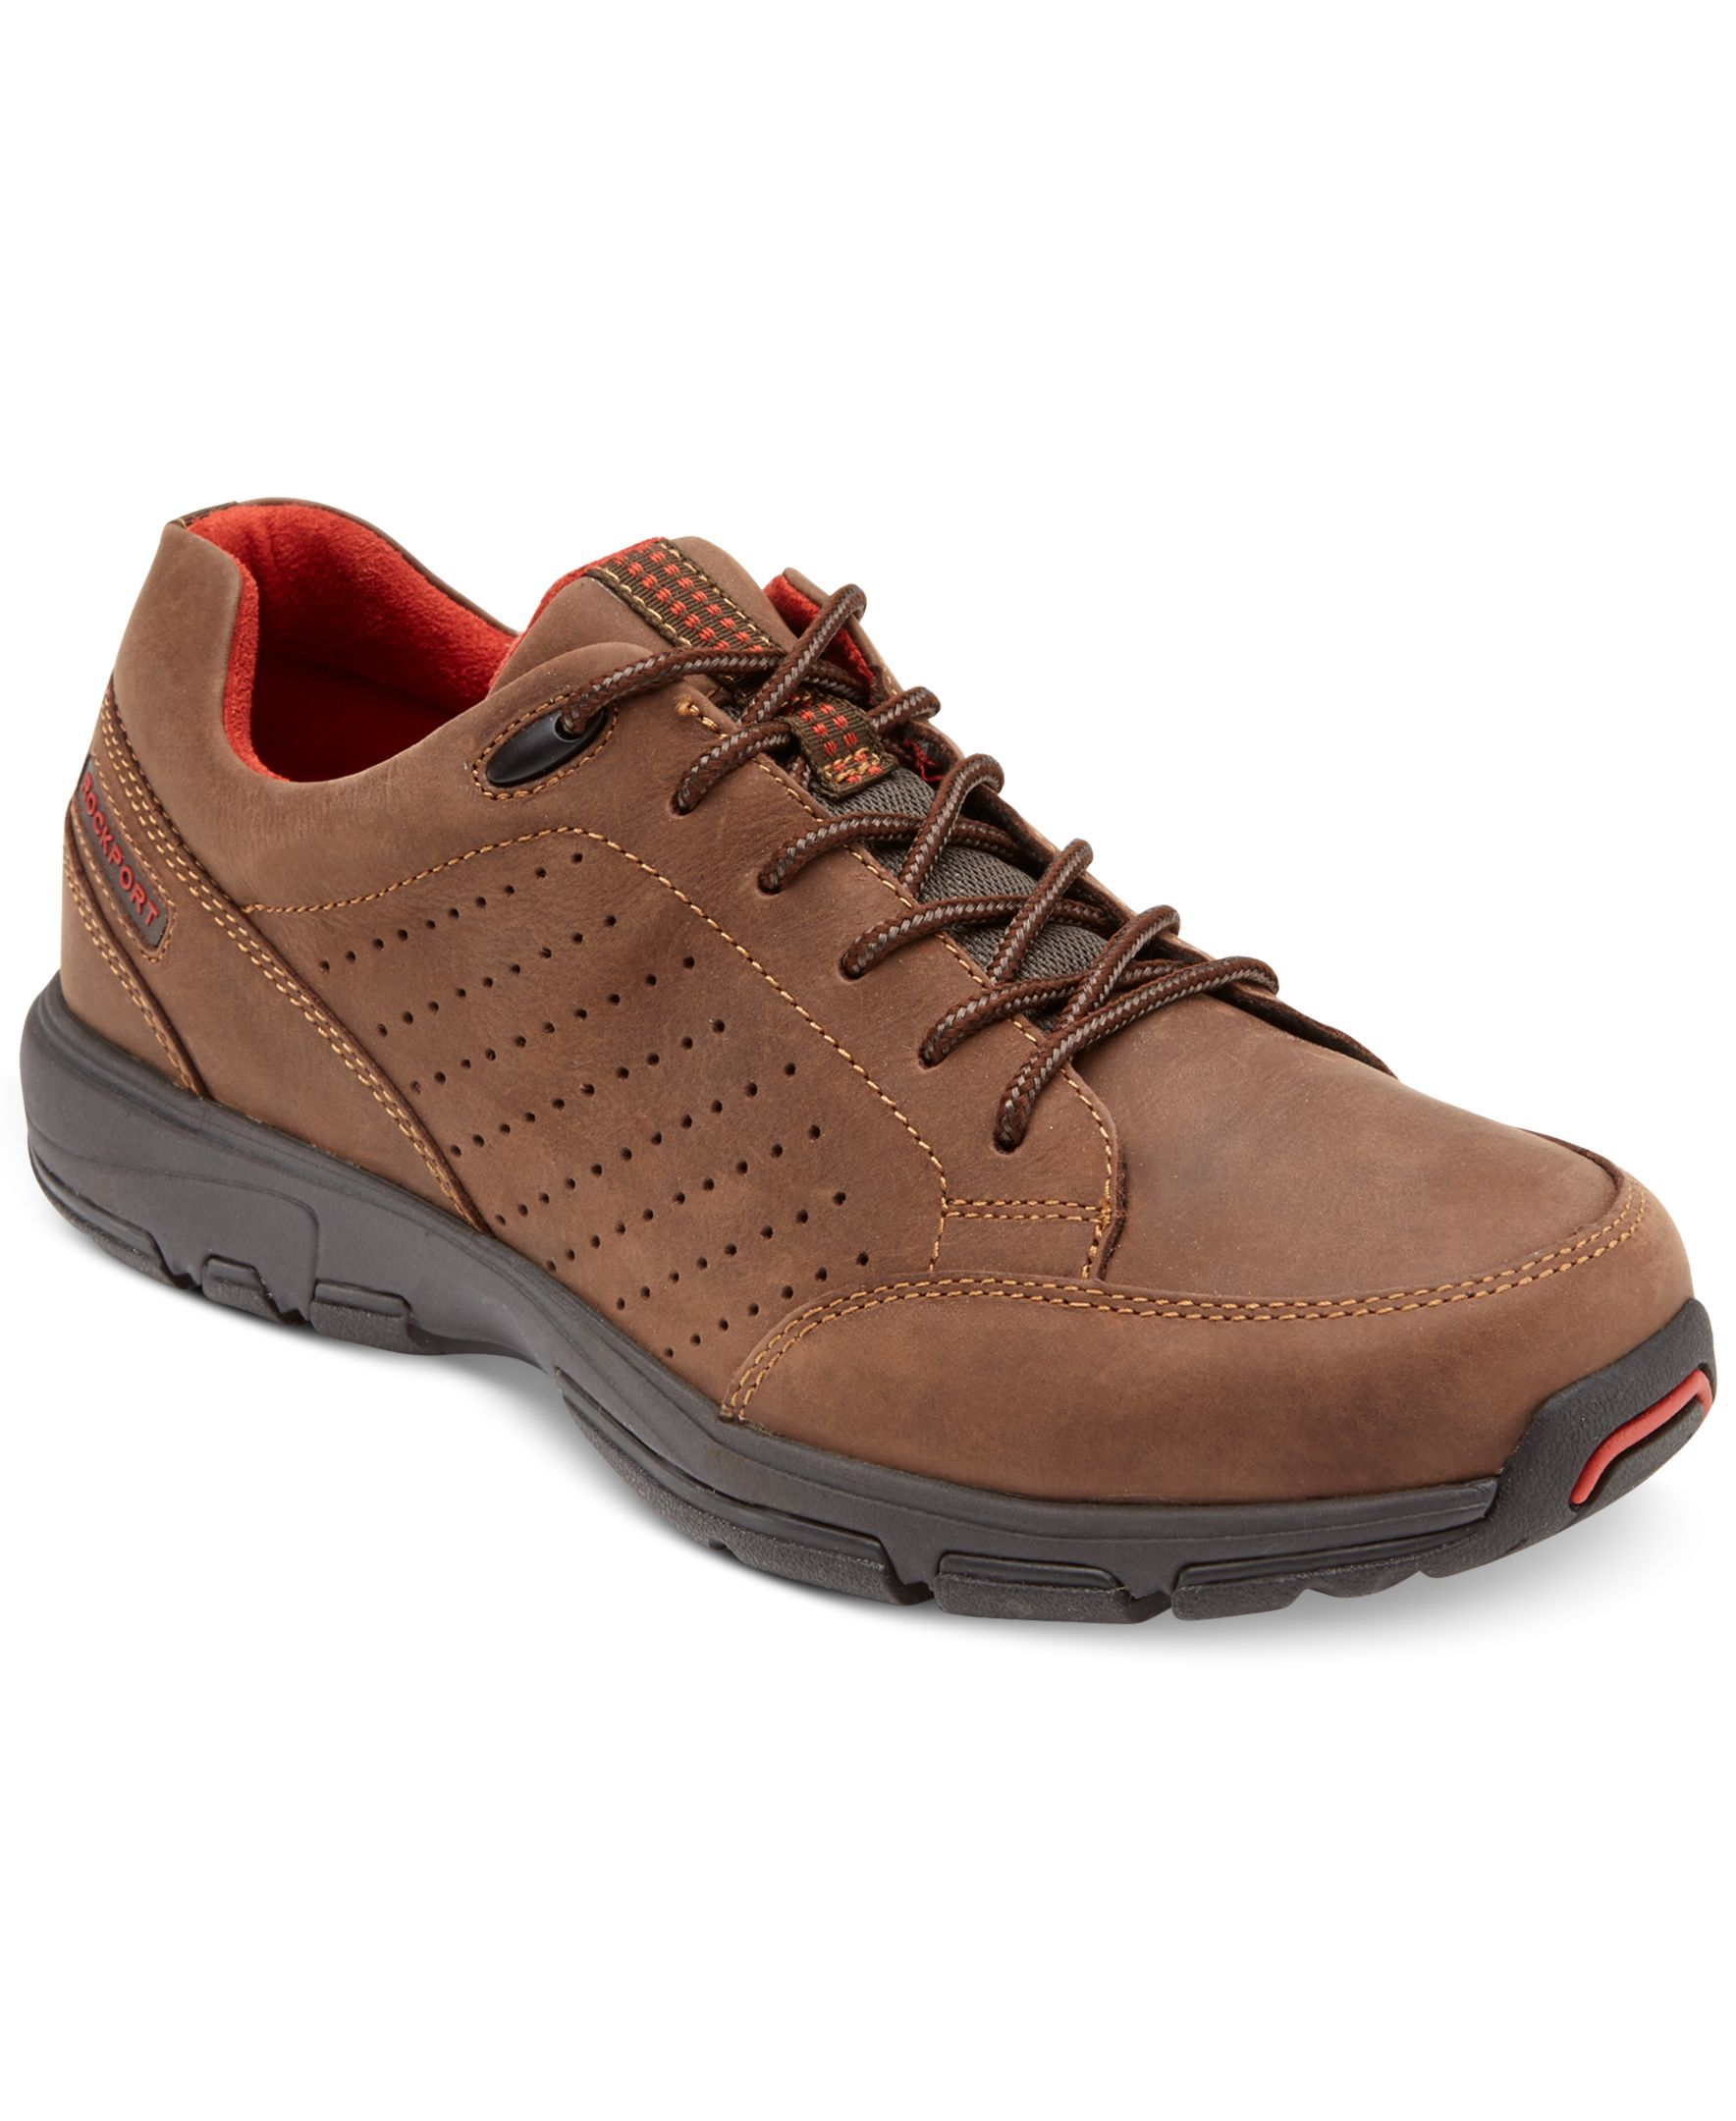 Rockport Xcs Myp Lace-Up Shoes